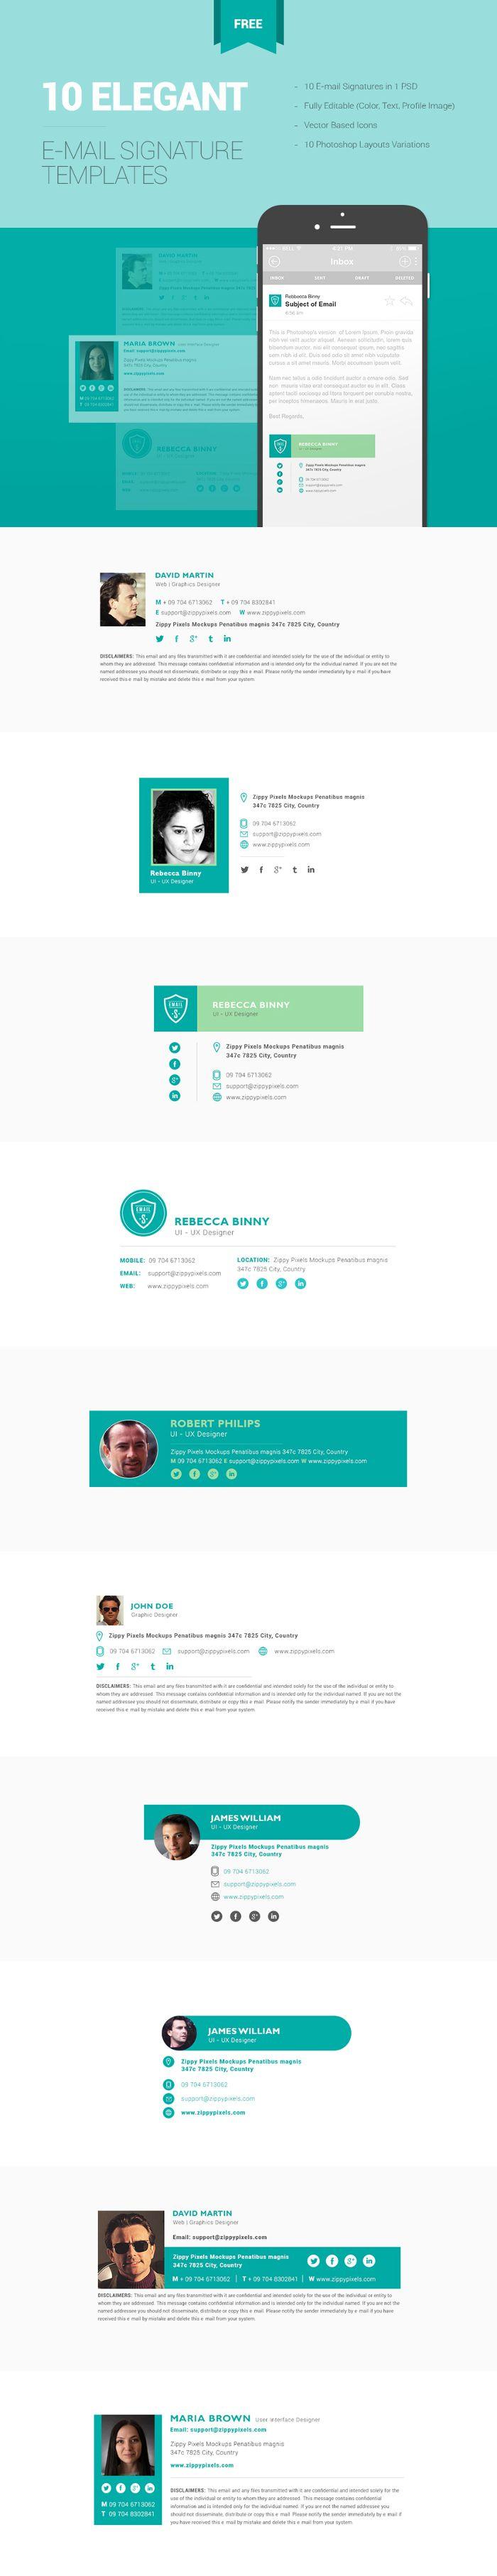 10 Elegant Free Email Signature Templates by ZippyPixels